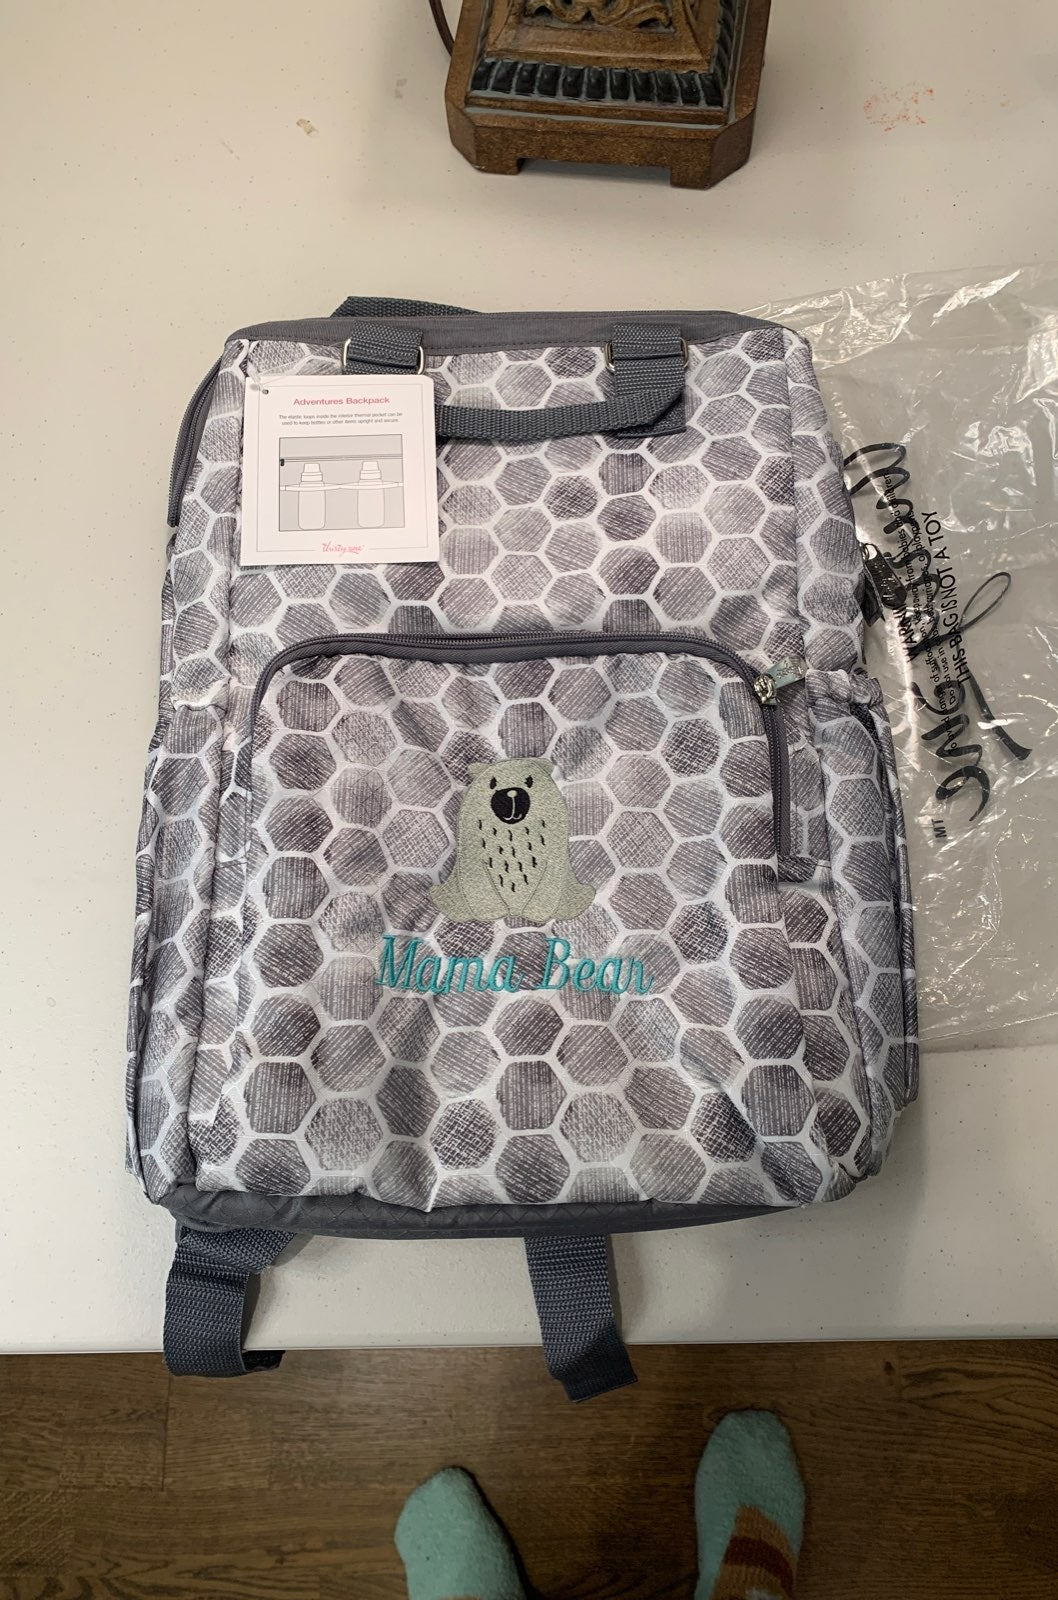 Adventures backpack